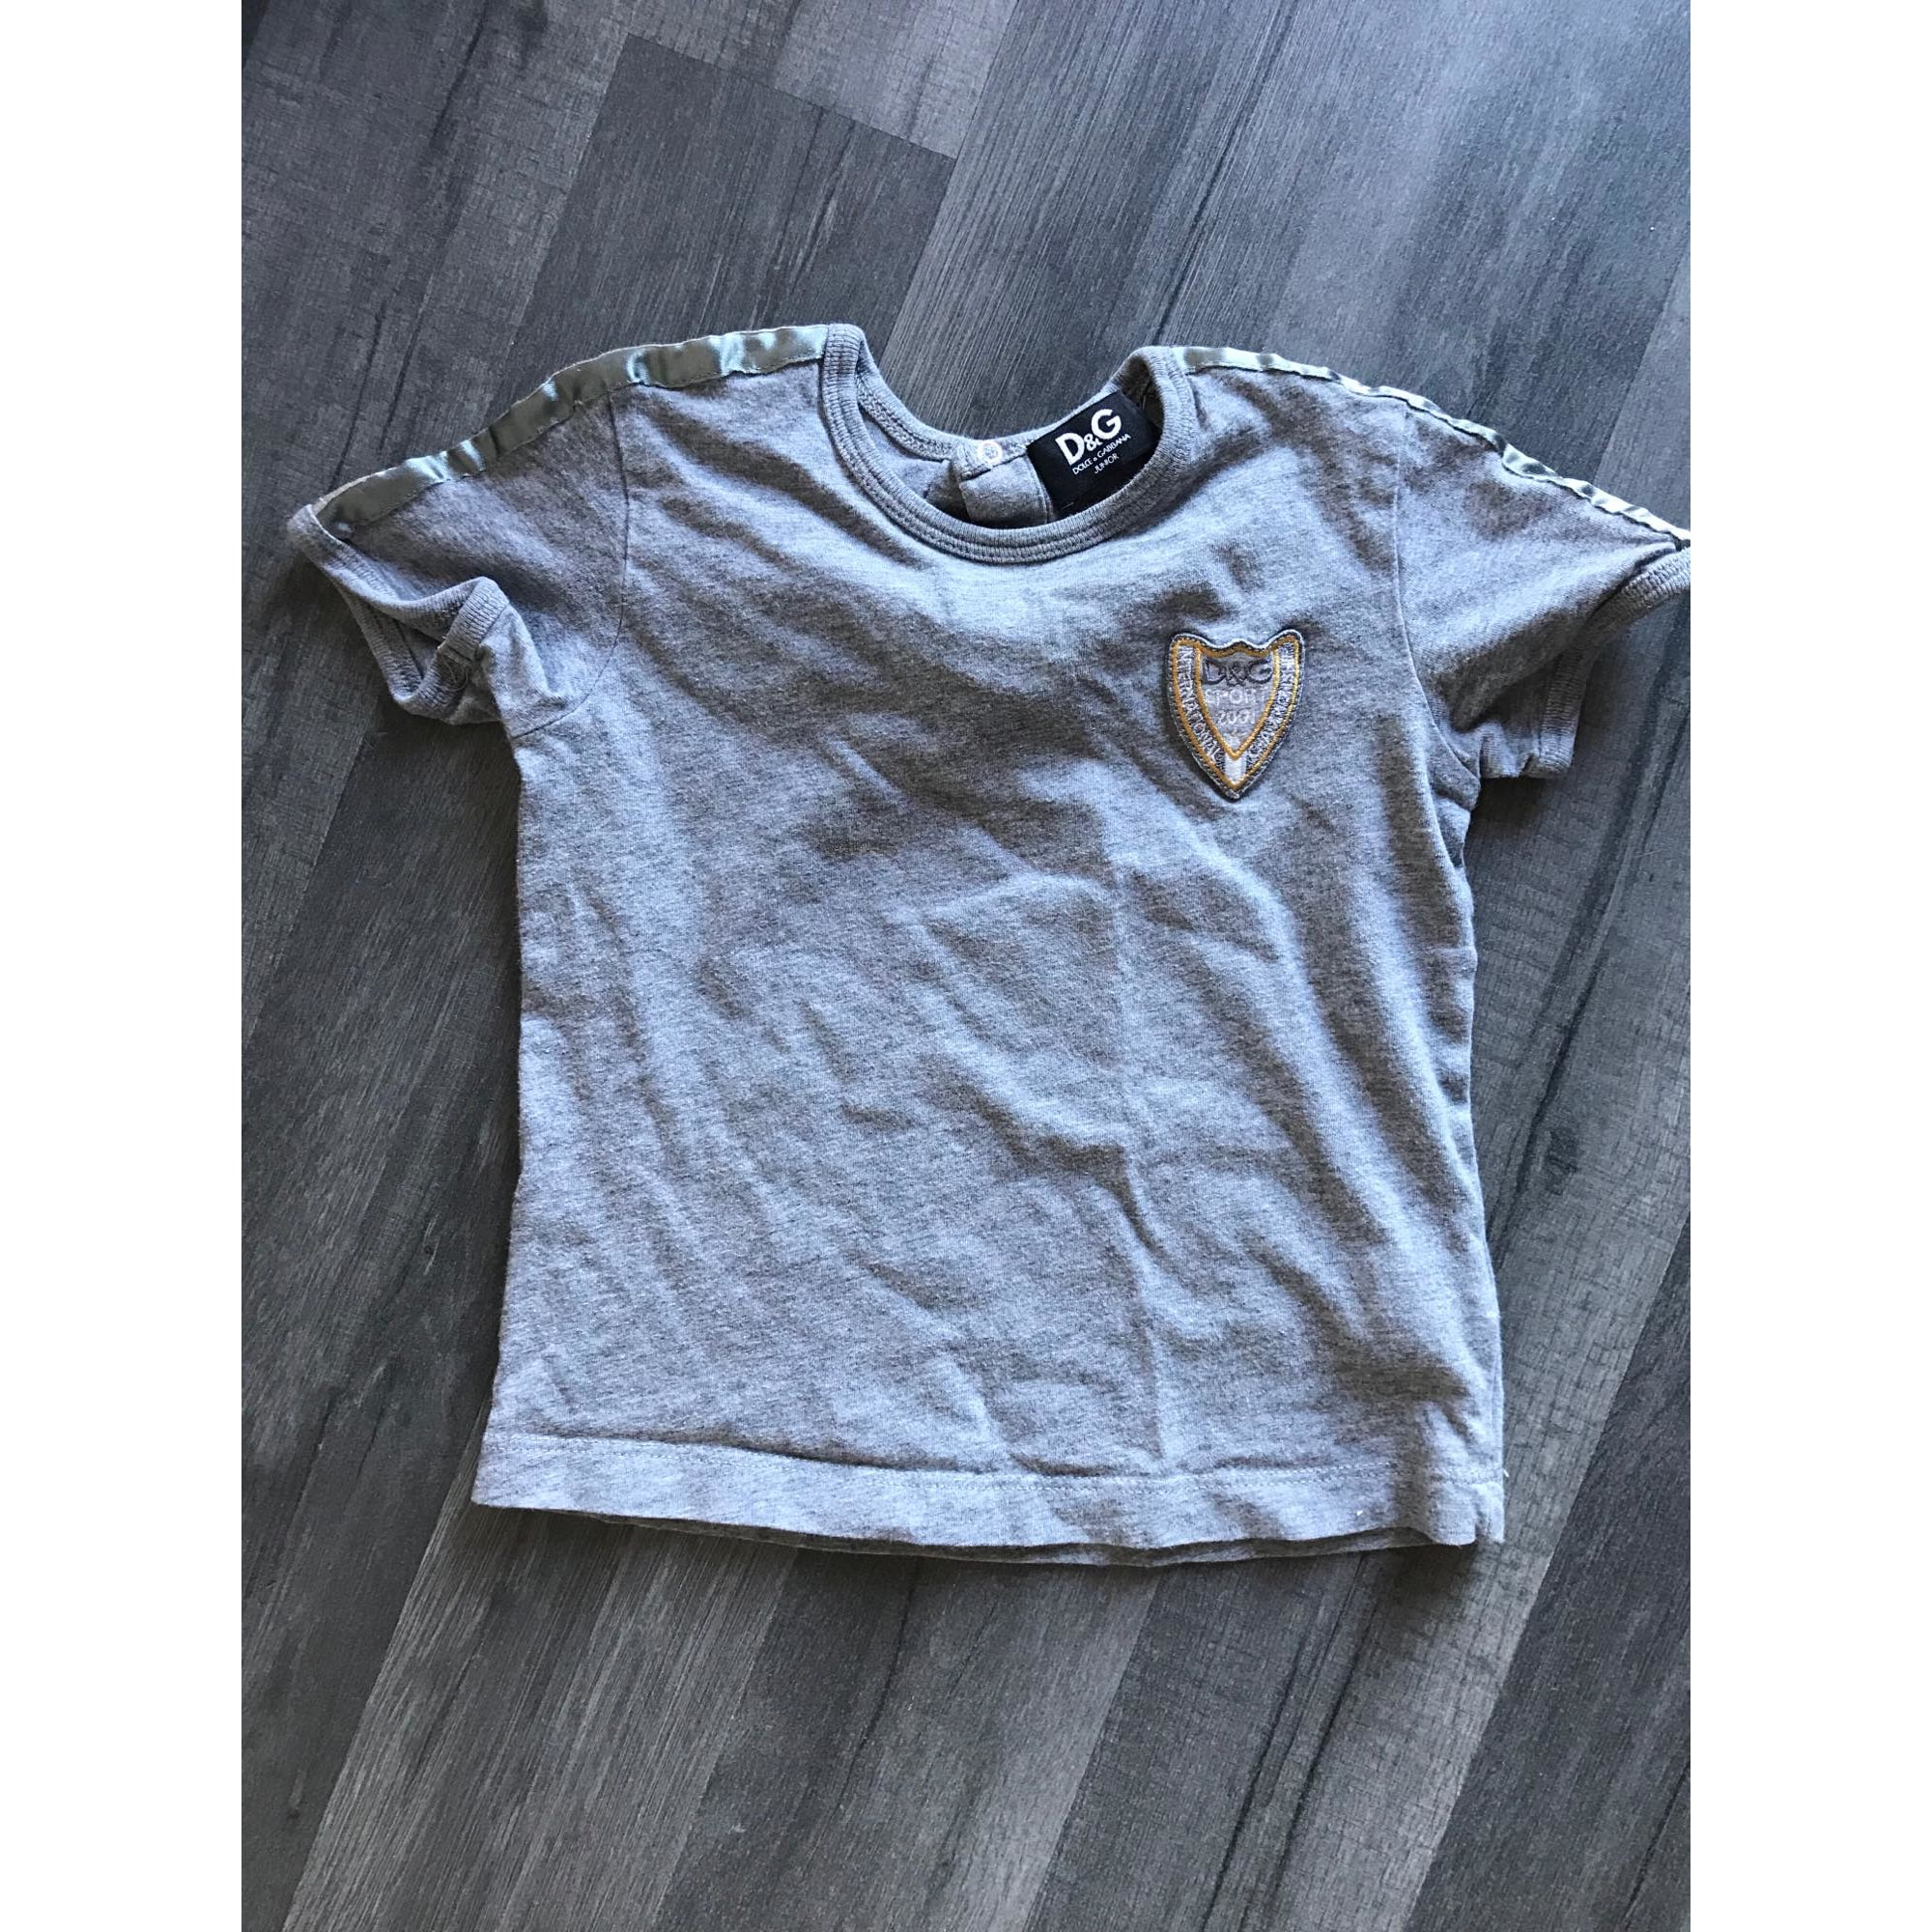 Top, tee shirt DOLCE & GABBANA Gris, anthracite